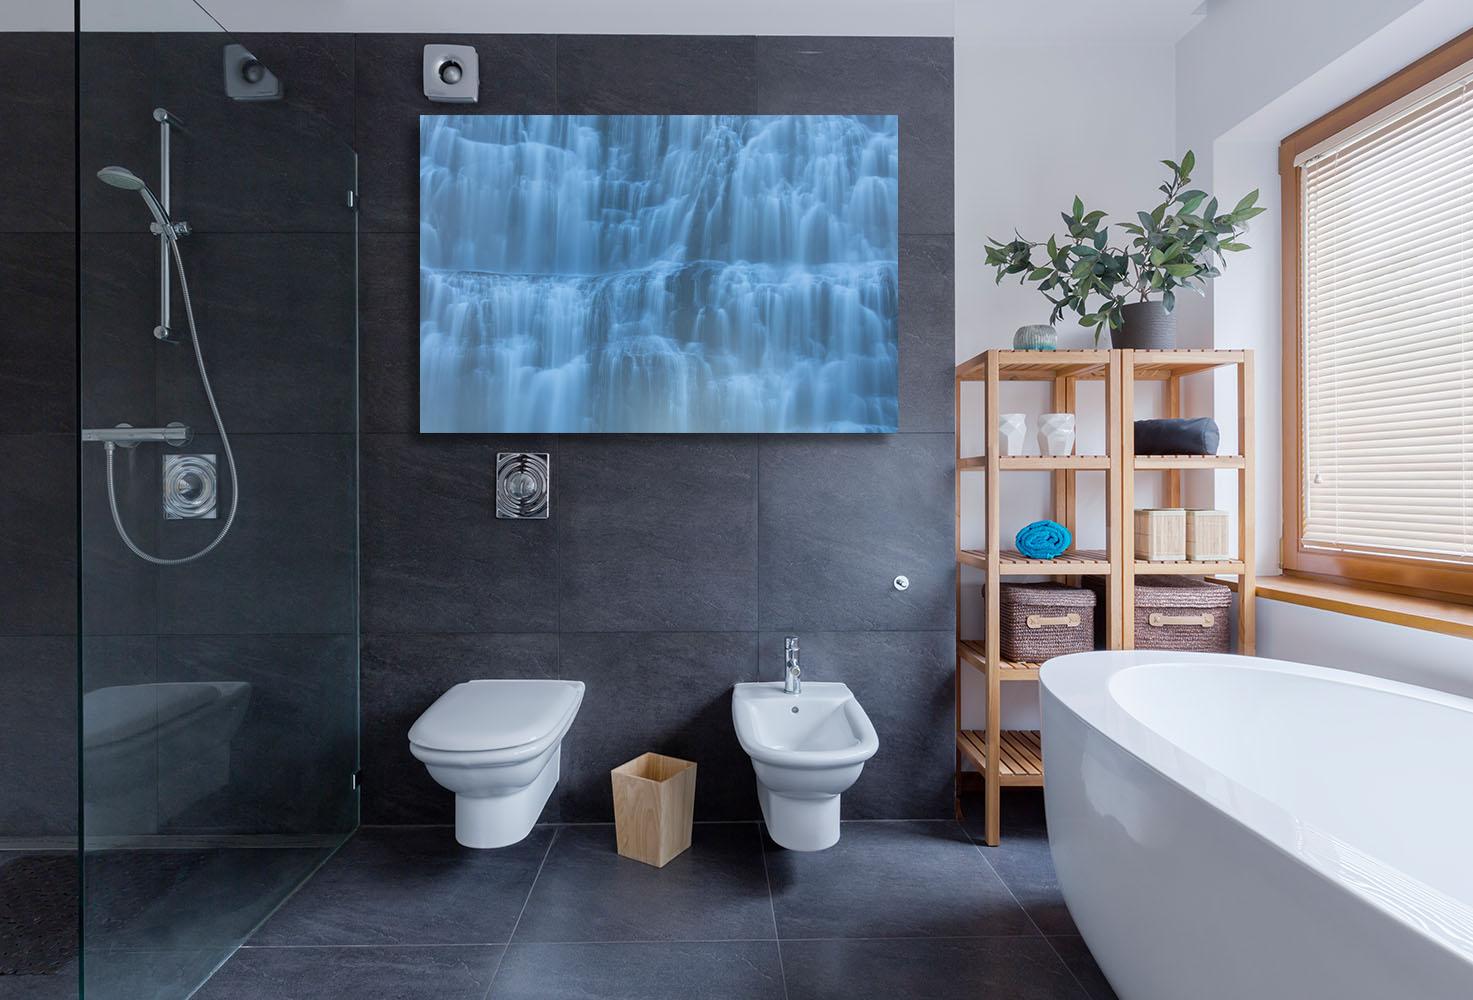 Iceland Fine Art Photography Waterfall Pure Luxury Home Decor Artwork Michael Andrejkow